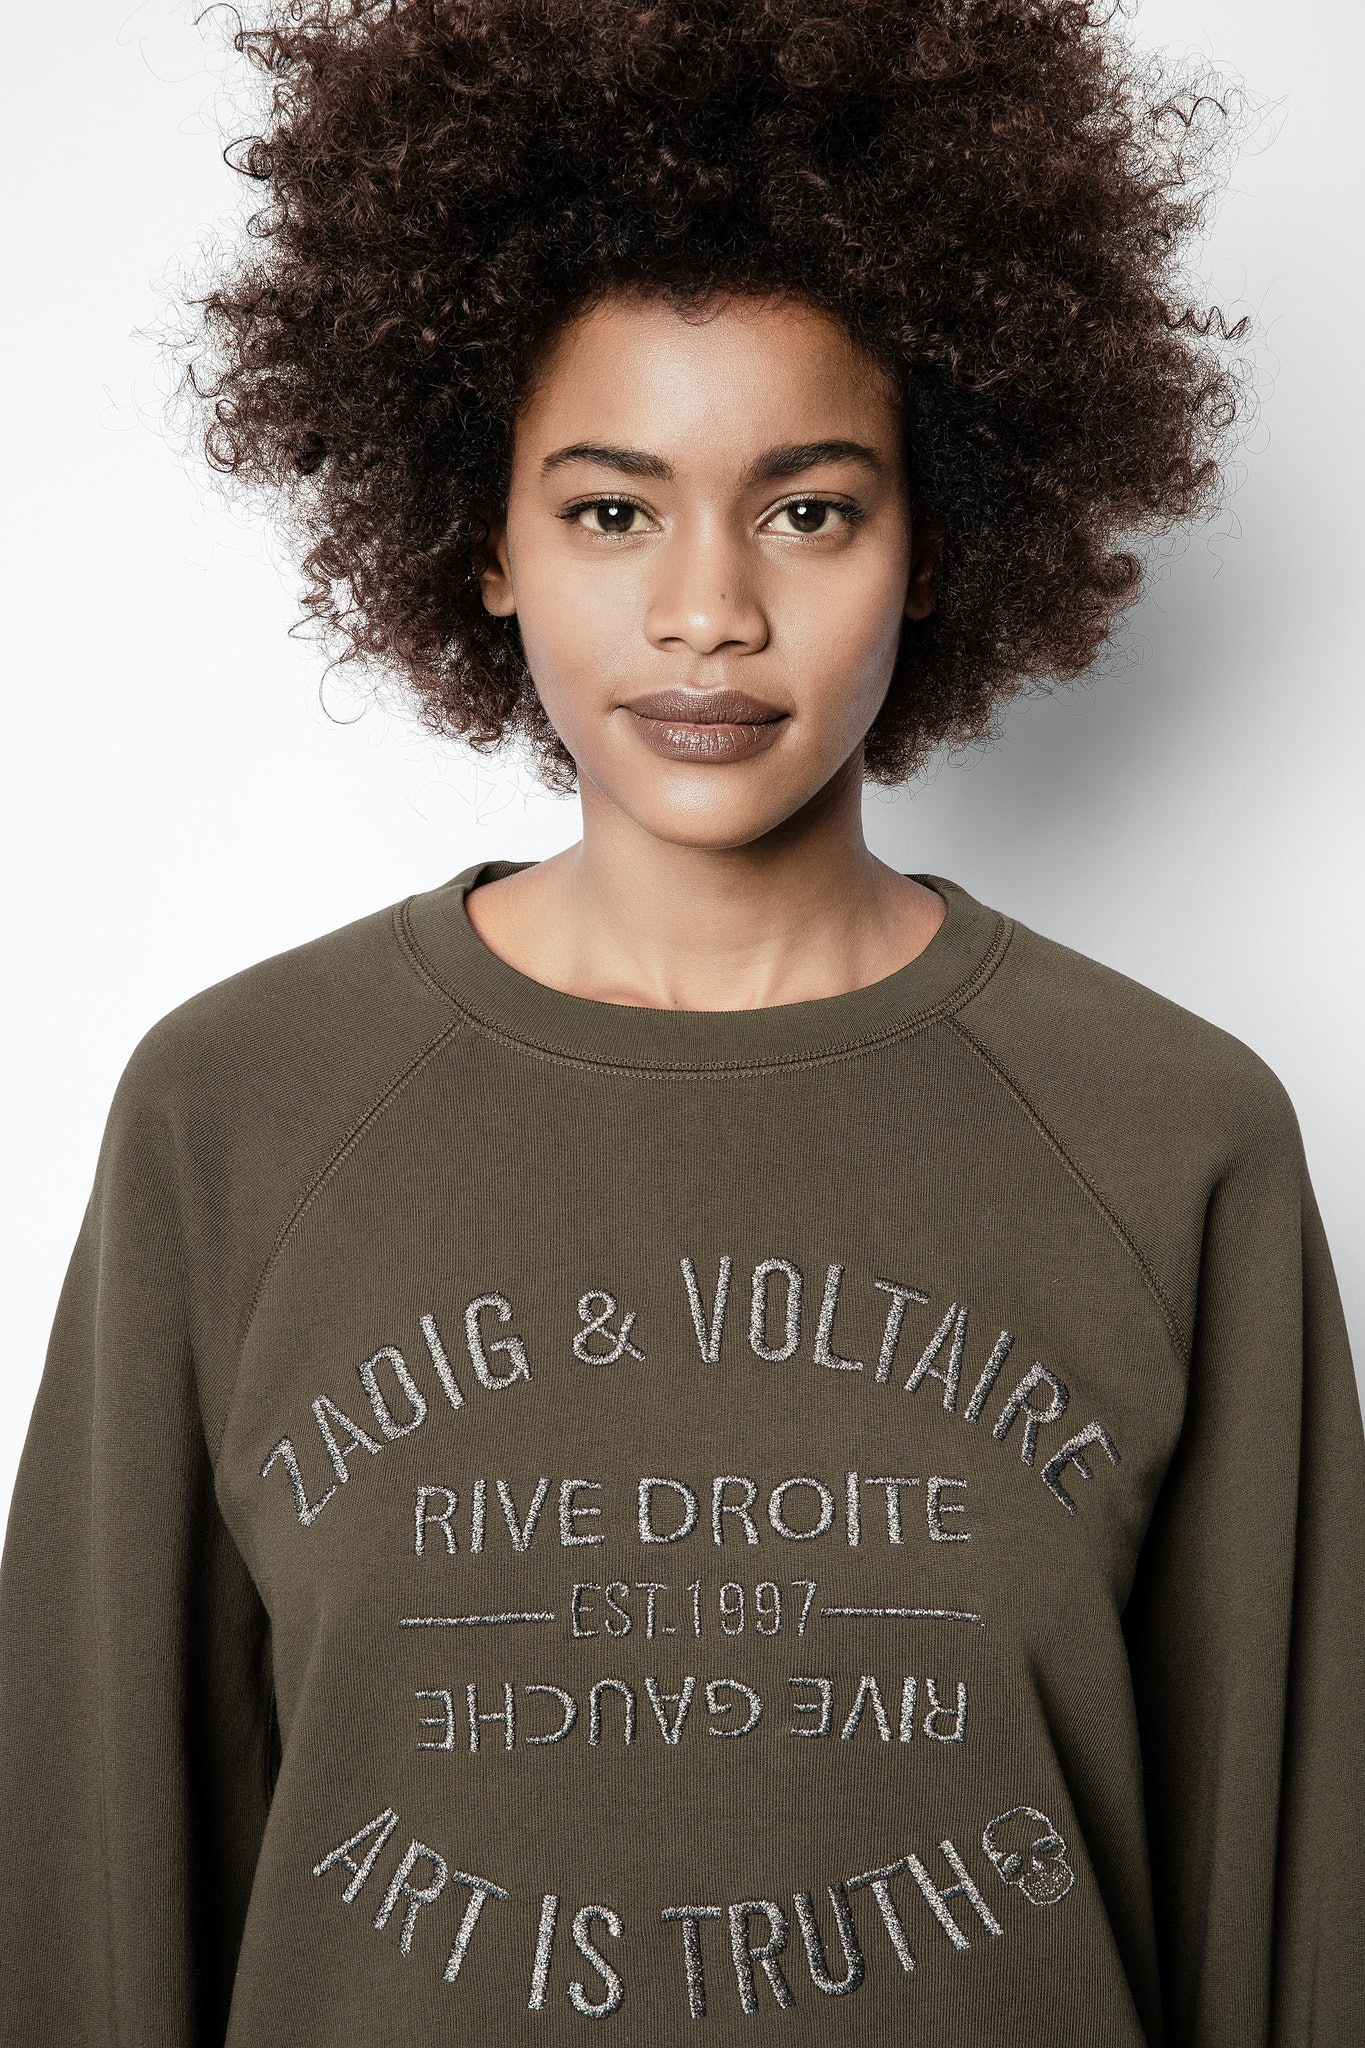 Upper Blason Brodé Sweatshirt